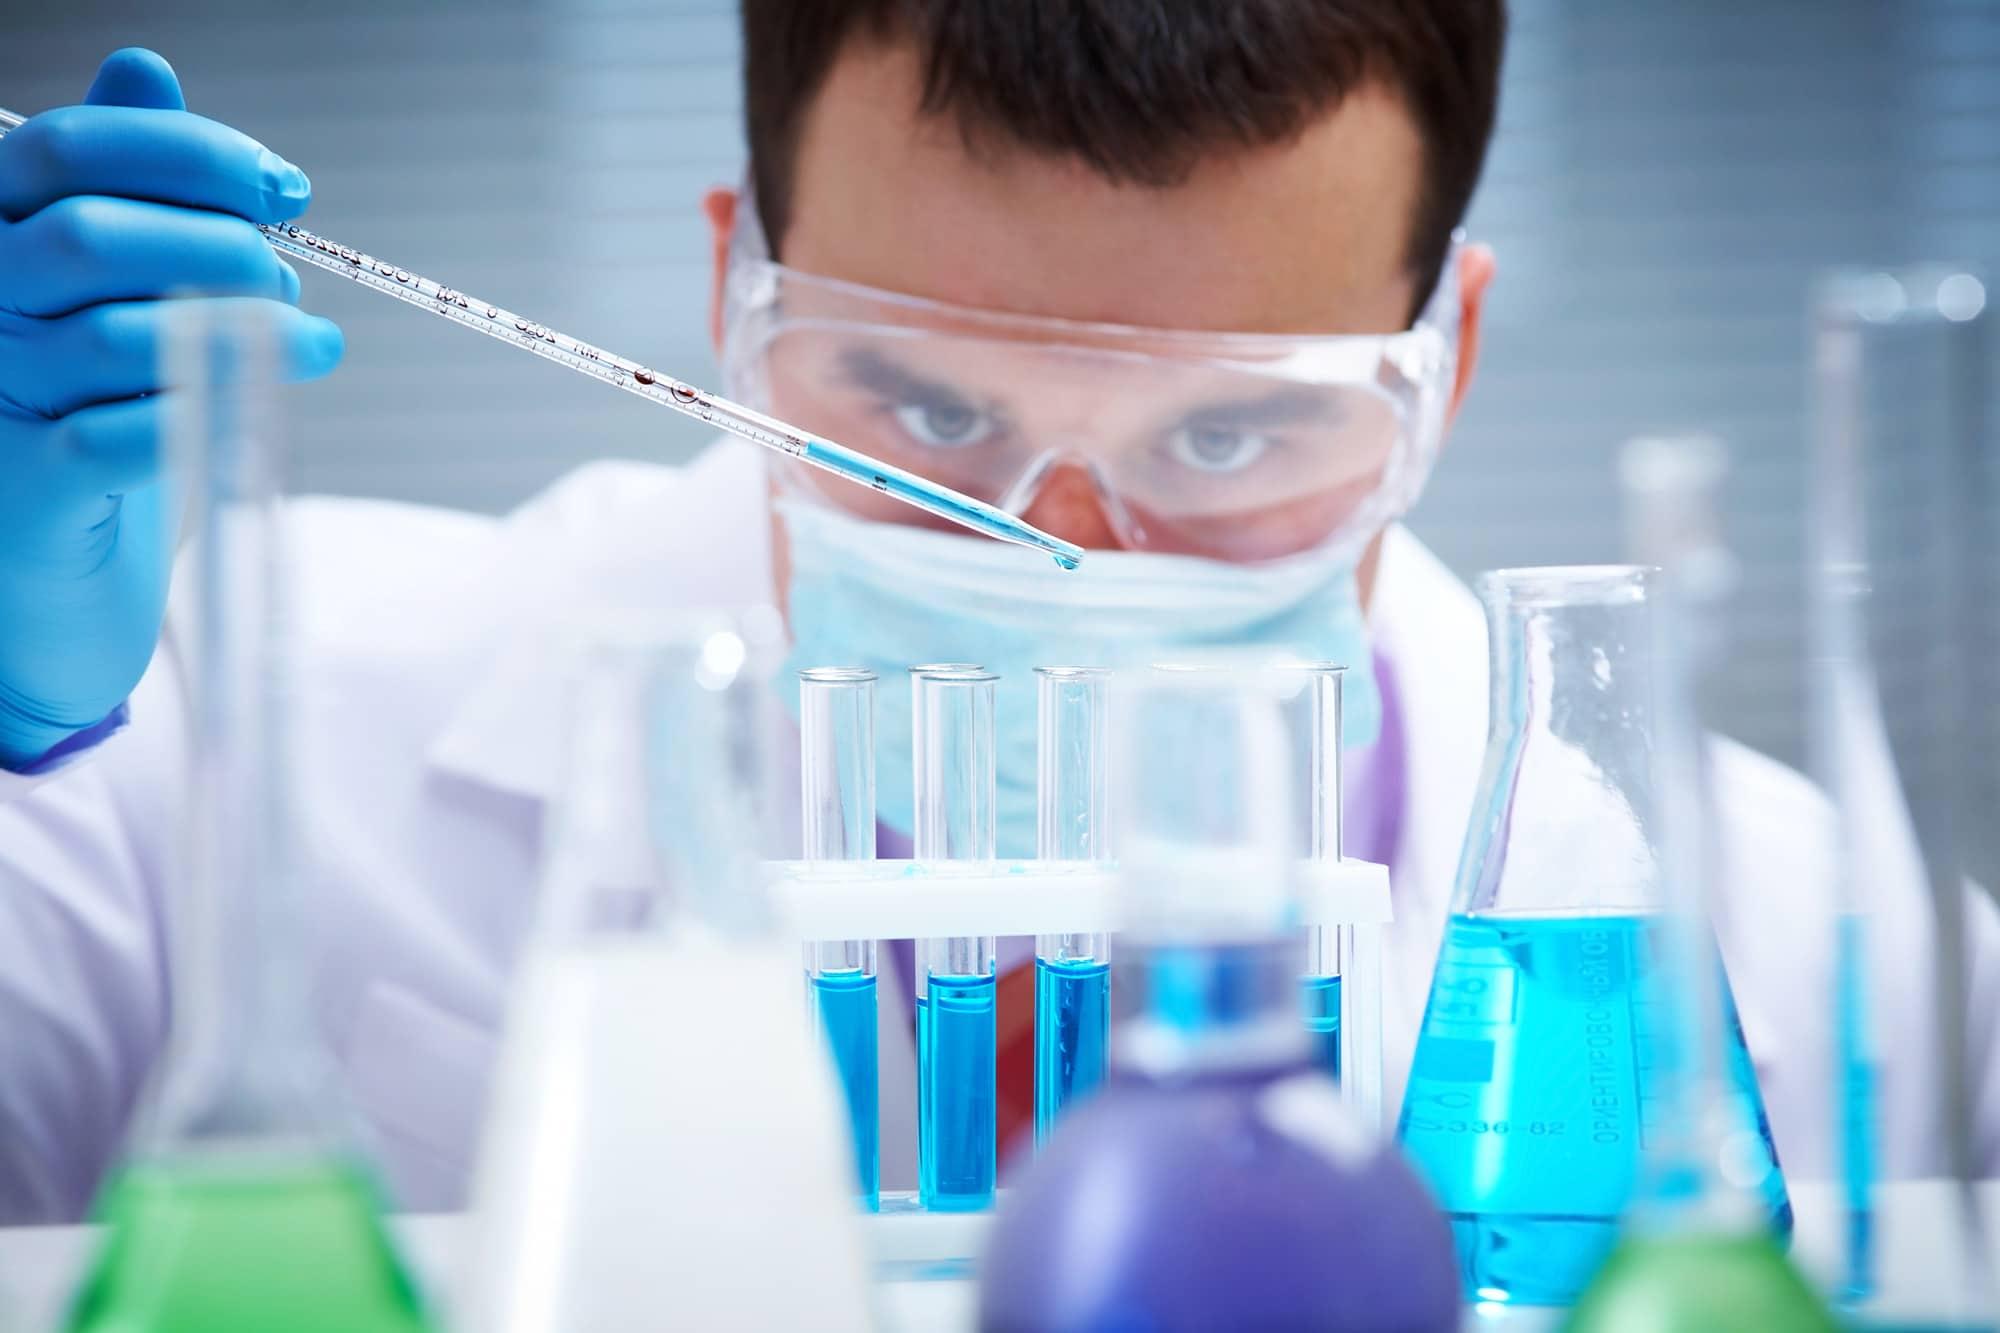 Particle Analysis Laboratory